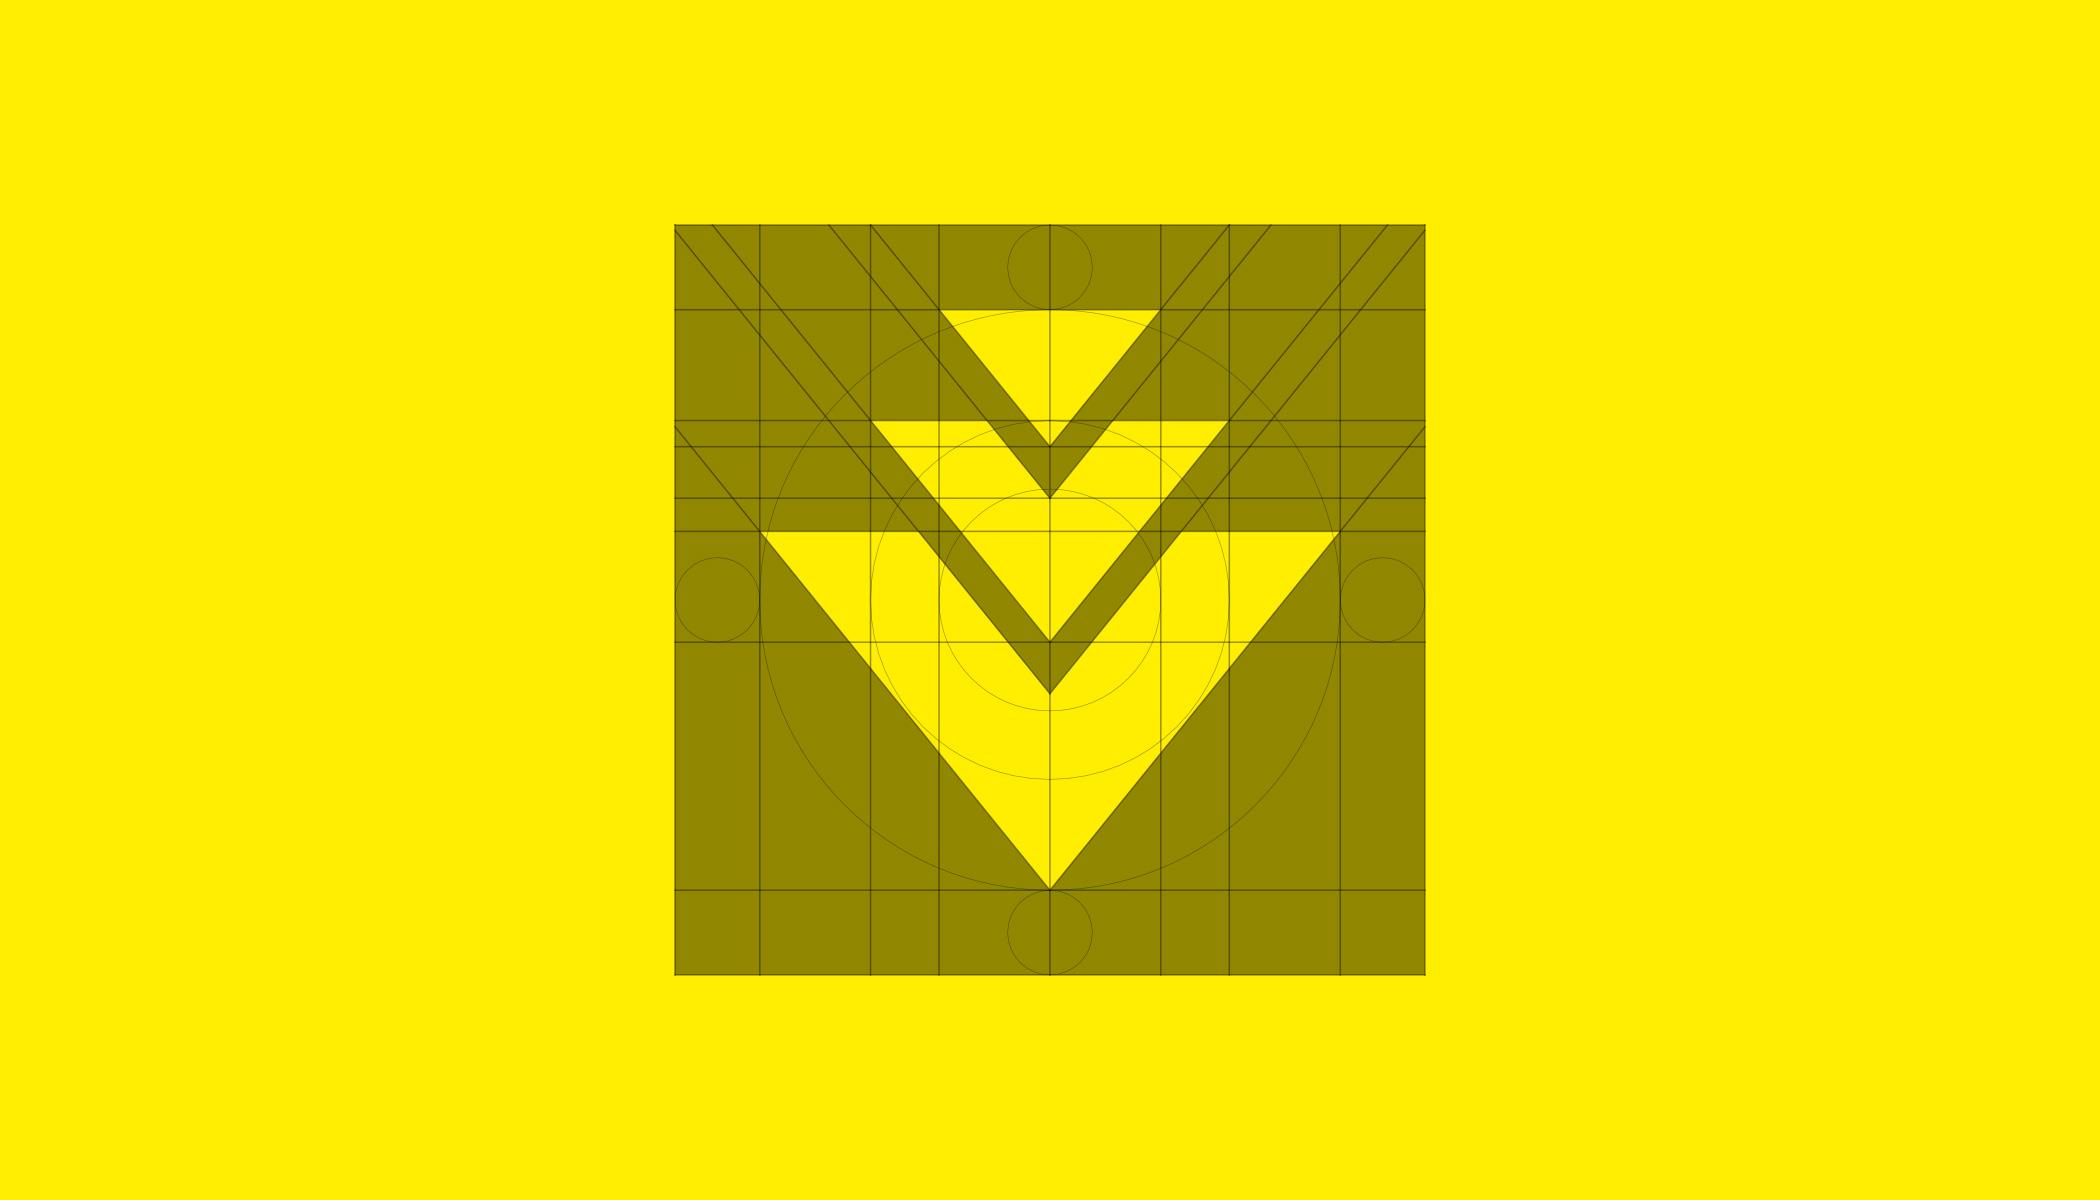 Kärcher - redesign concept: Logo grid